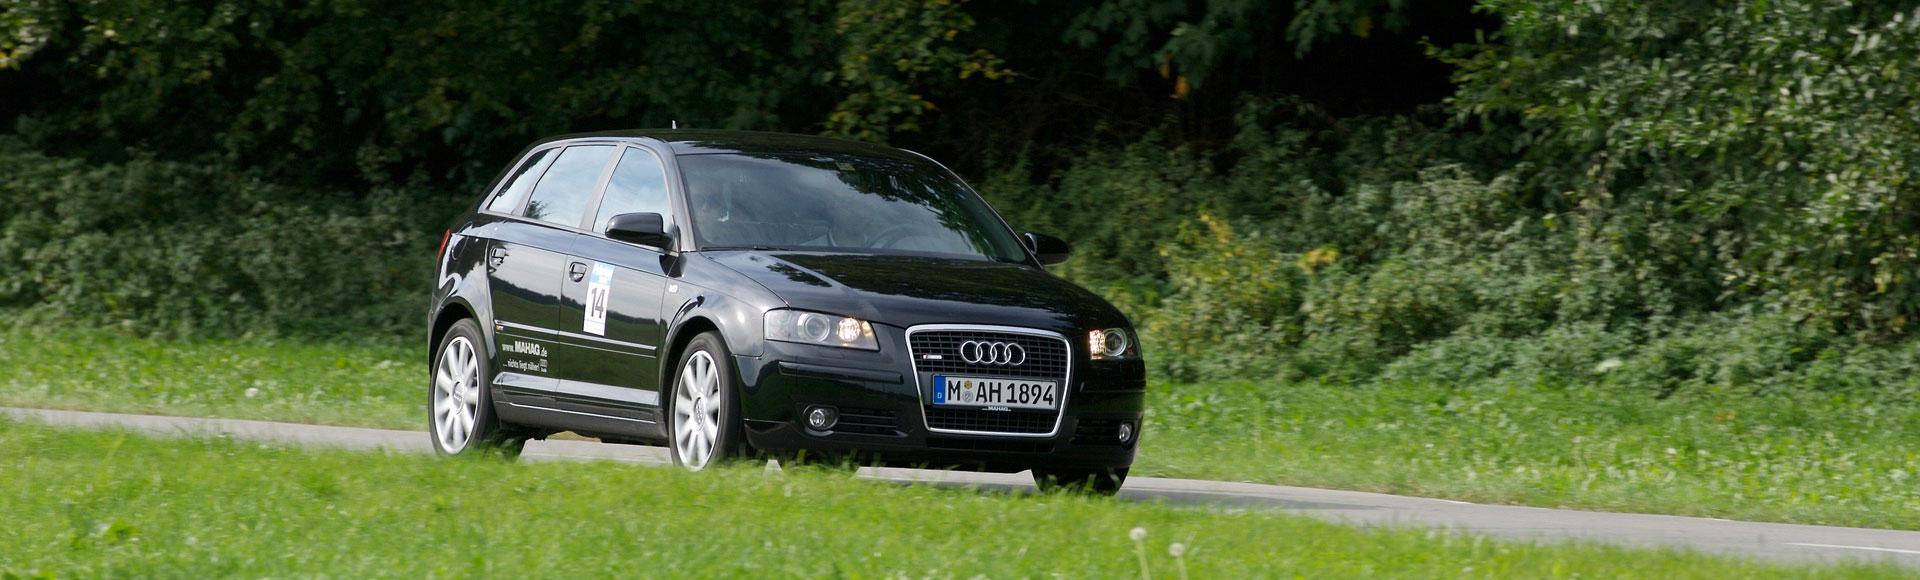 Audi A3 Sommer 2006 394